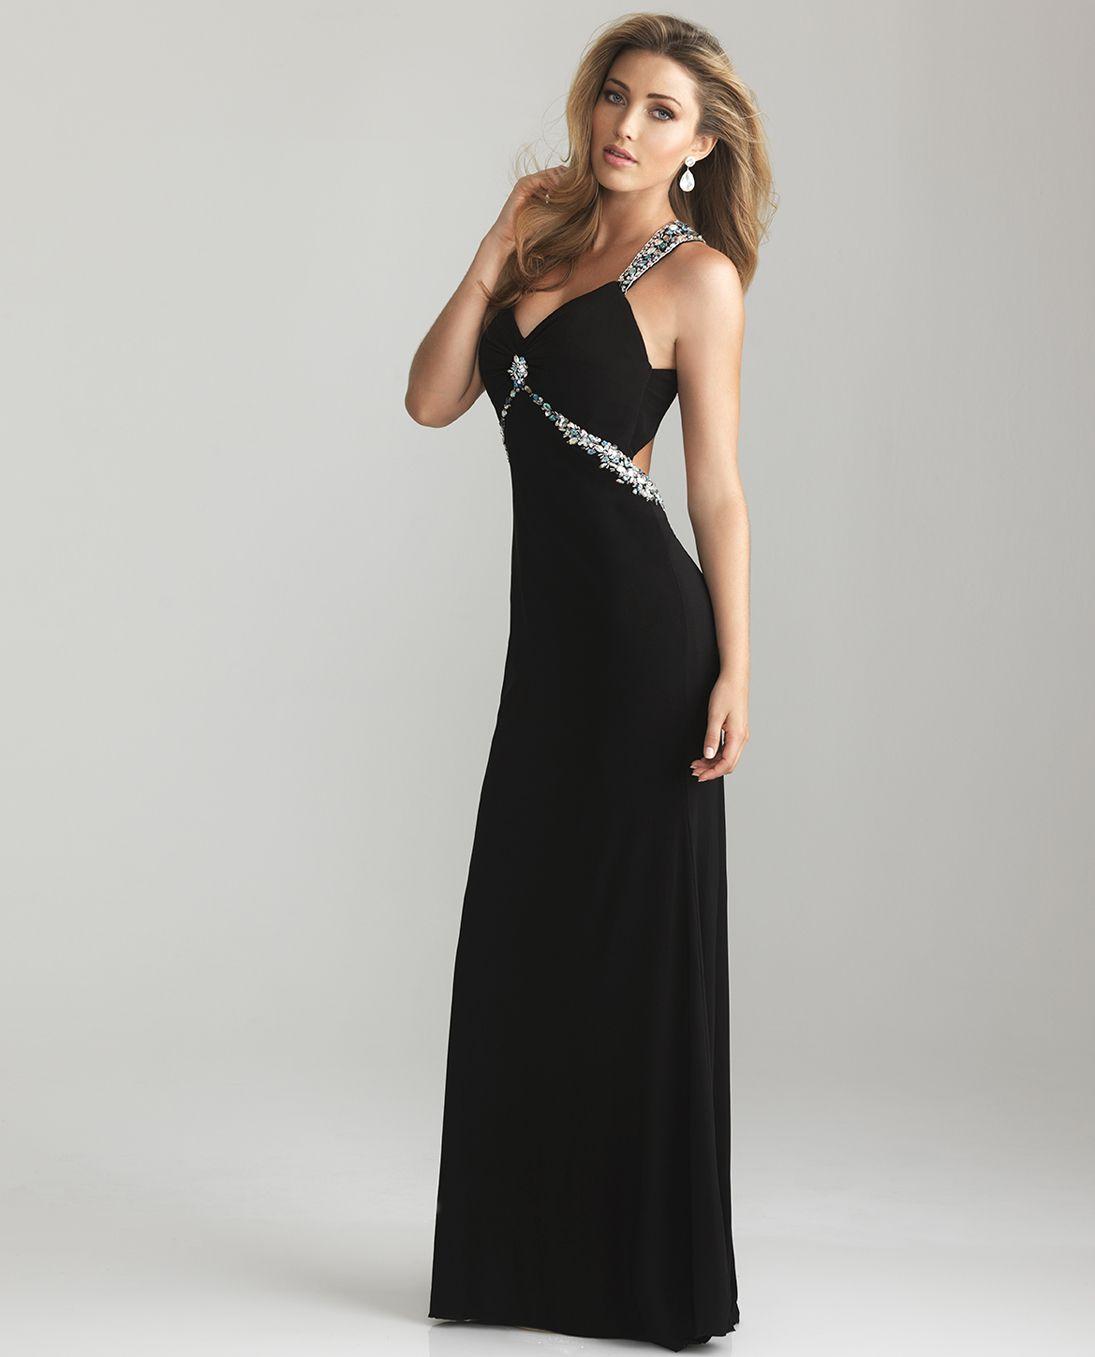 Unique Vintage Prom Dresses Chiffon Prom Dress Black Prom Dresses [ 1357 x 1095 Pixel ]